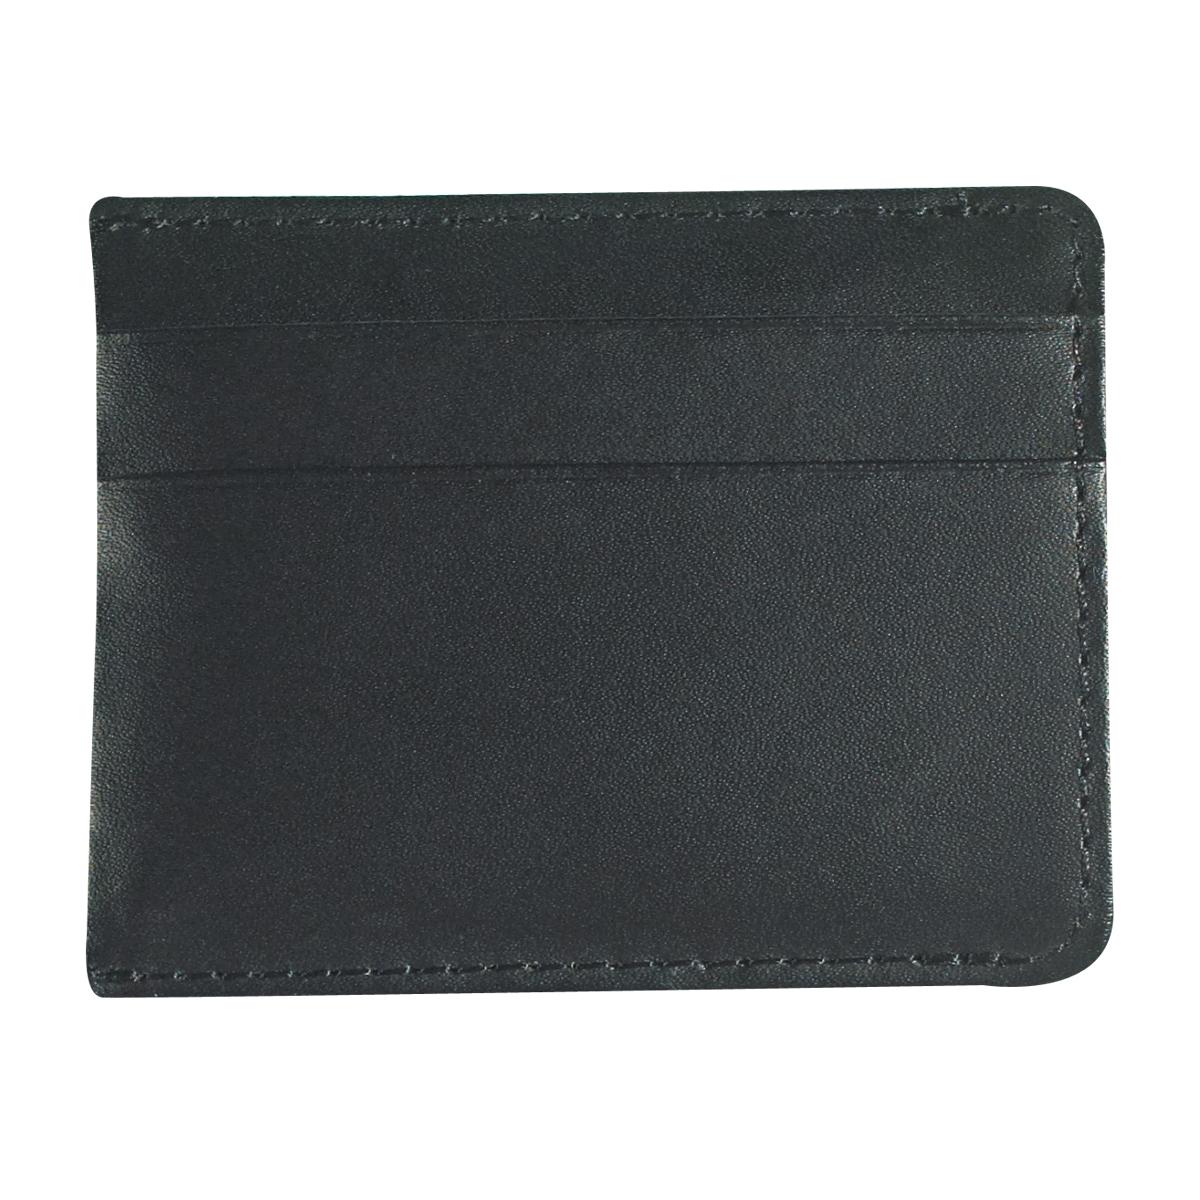 #CM 9485 Money Clip Card Holder